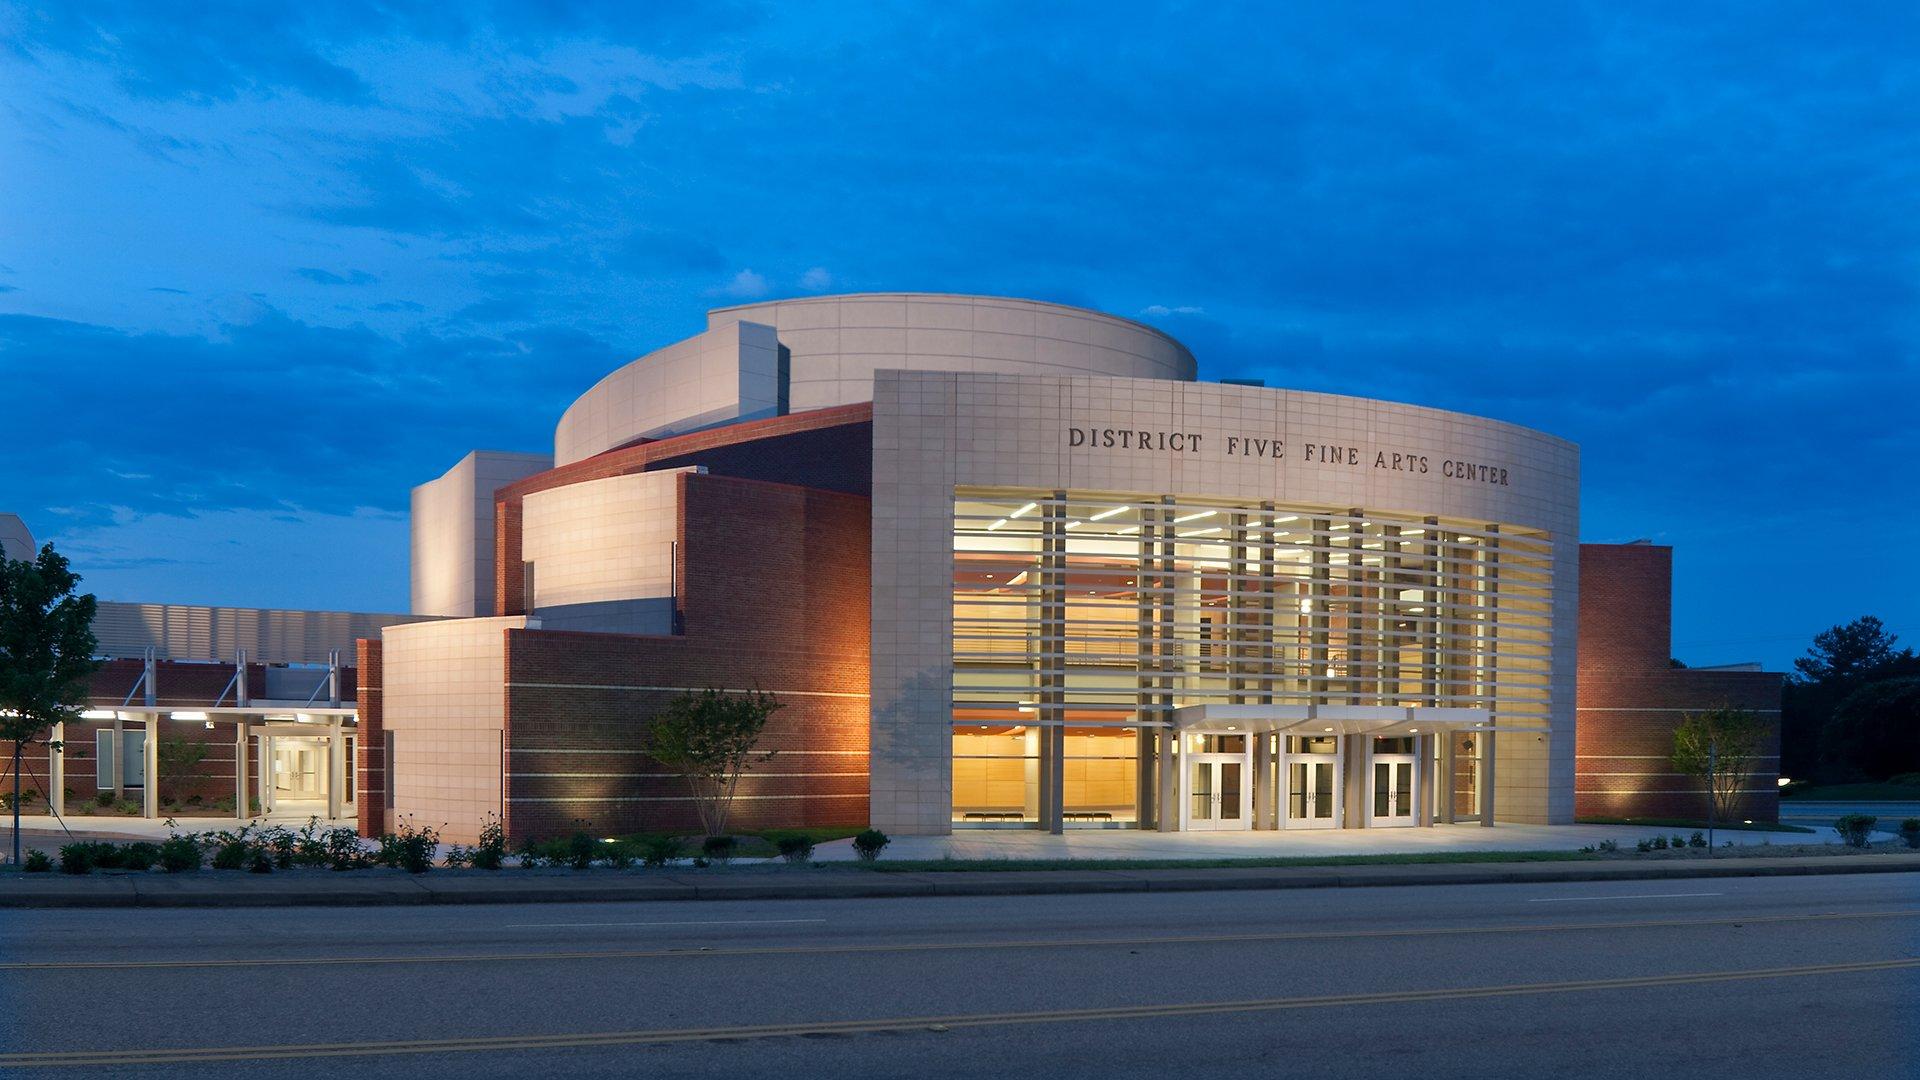 Spartanburg School District Five Fine Arts Center, Exterior at Night